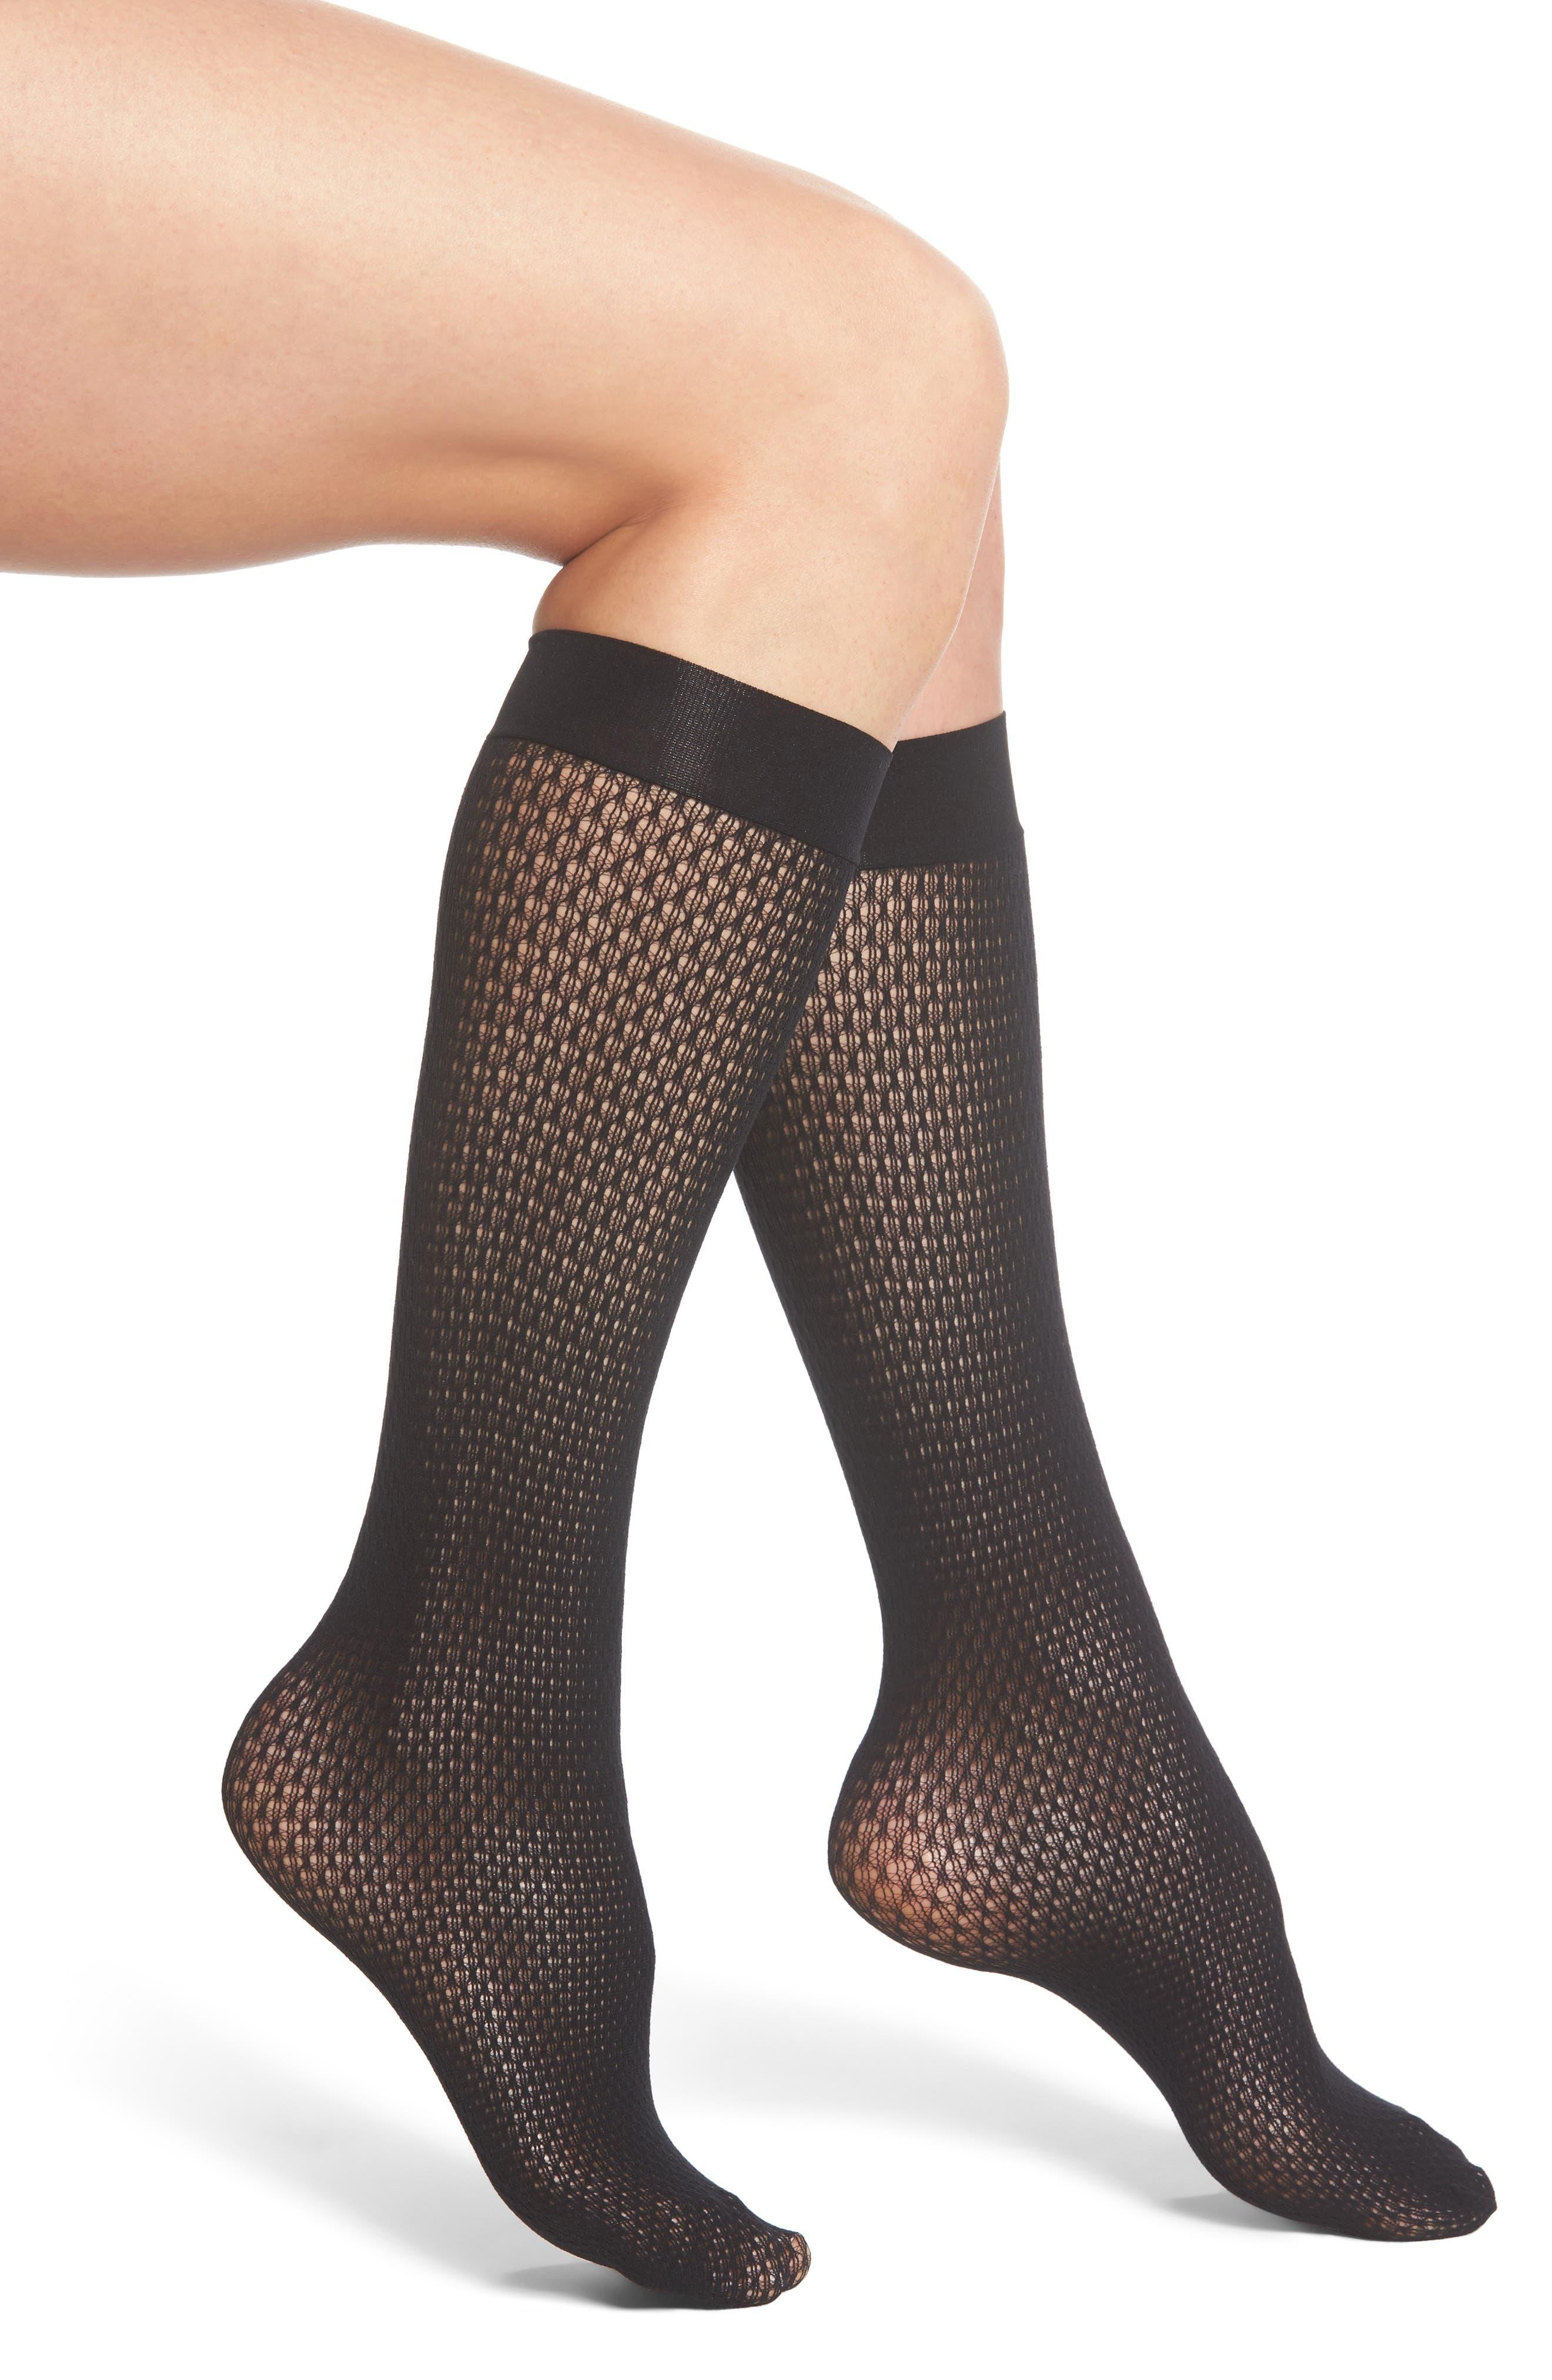 Rhomb Net Knee High Stockings,                             Main thumbnail 1, color,                             Black